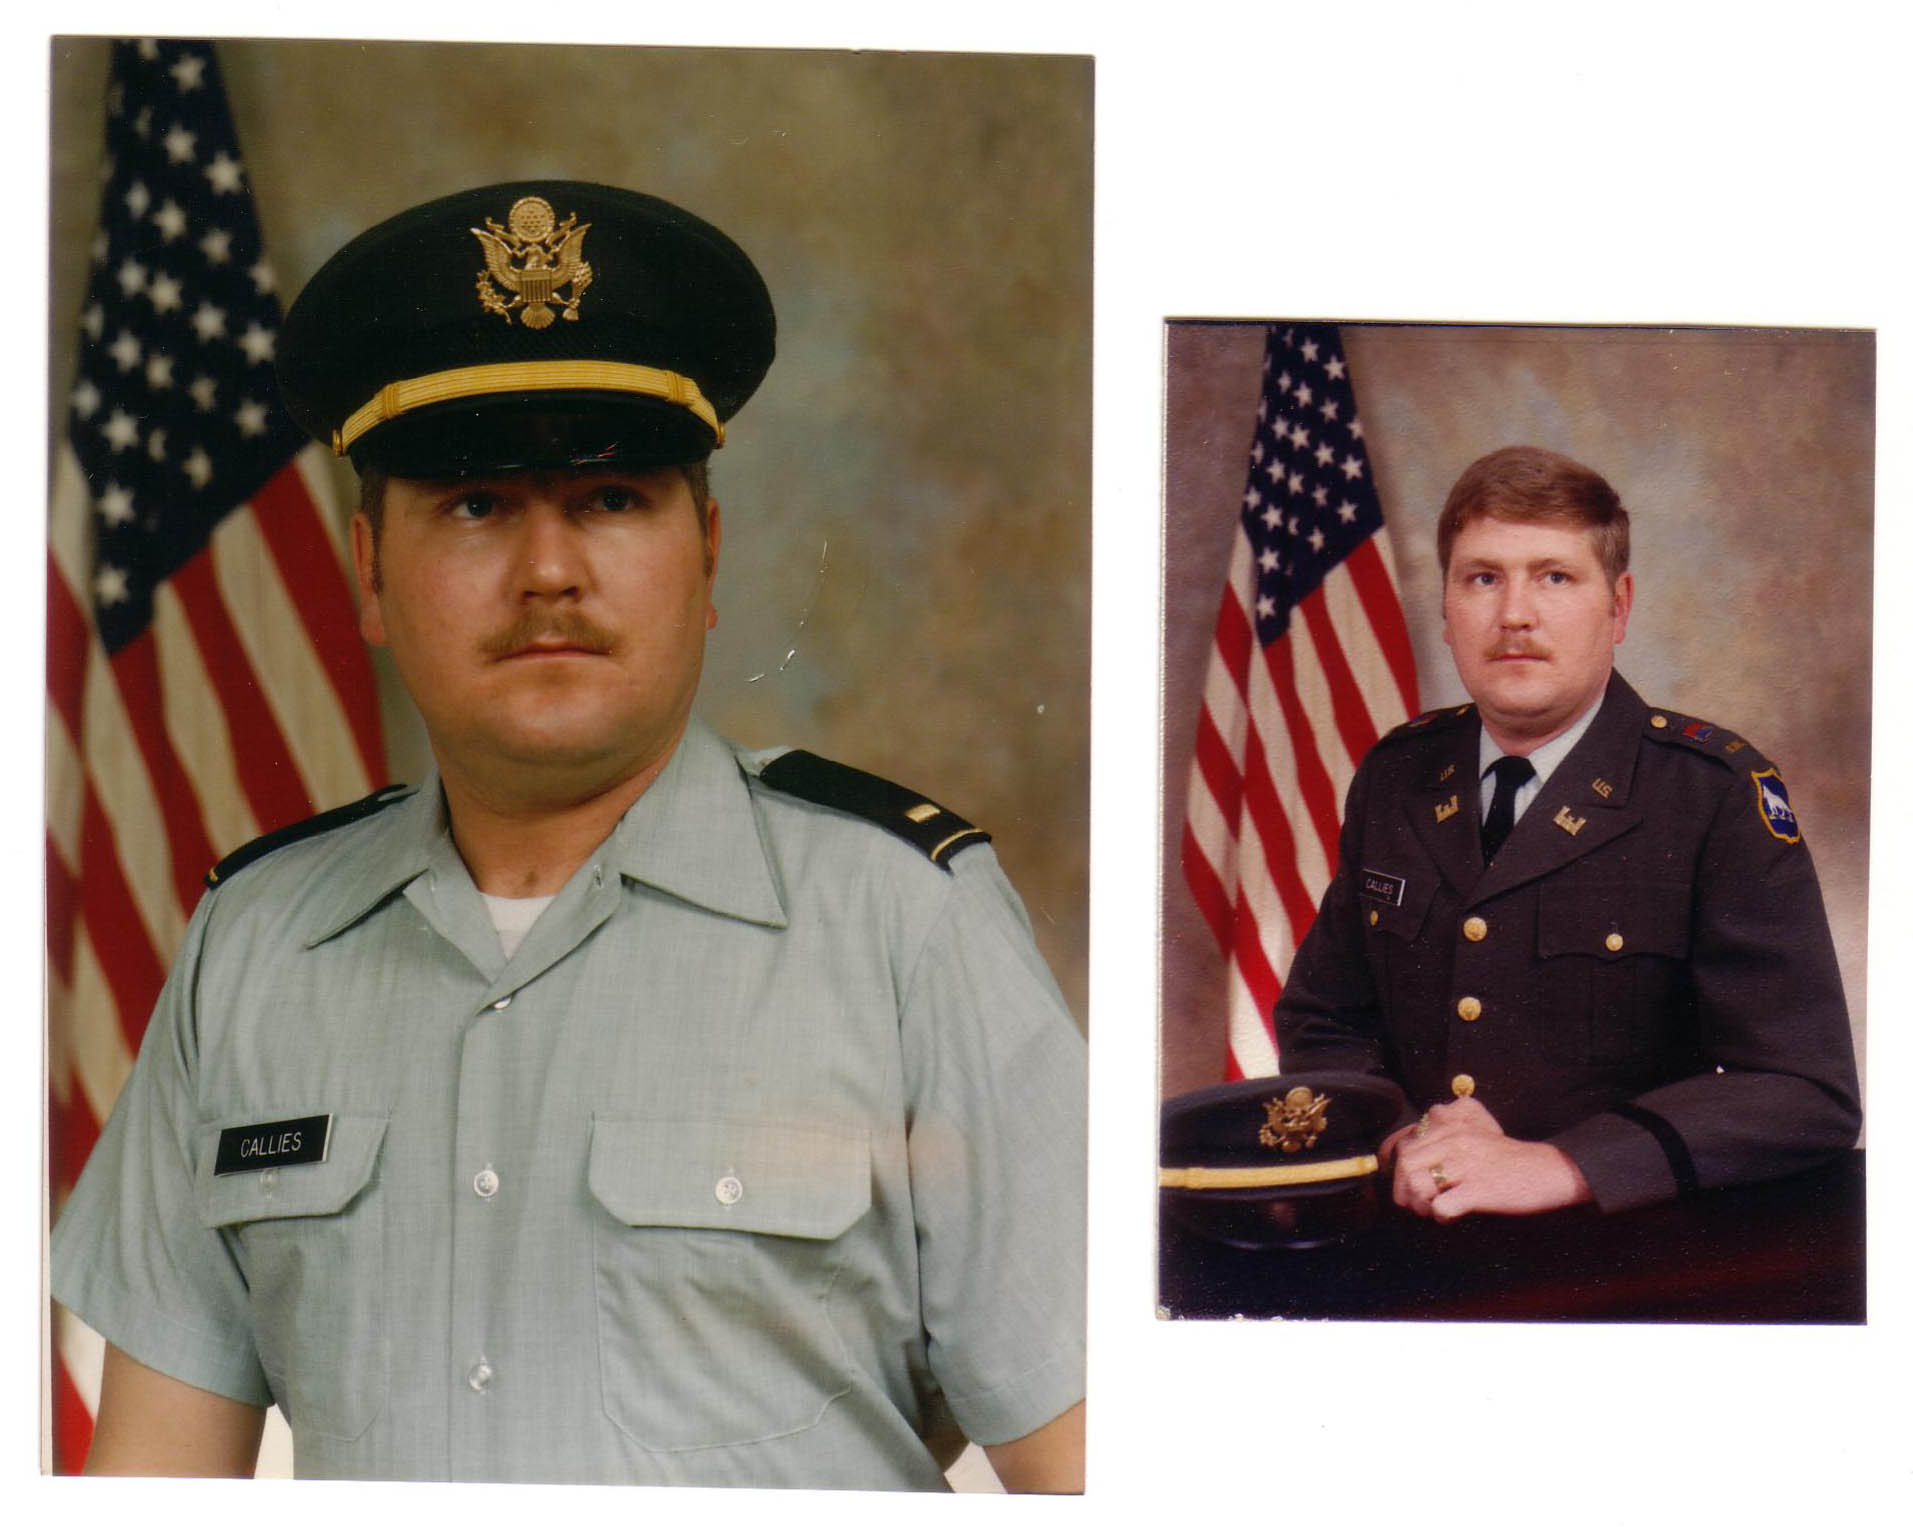 Sergeant Thomas Lloyd Callies | Huron Police Department, South Dakota